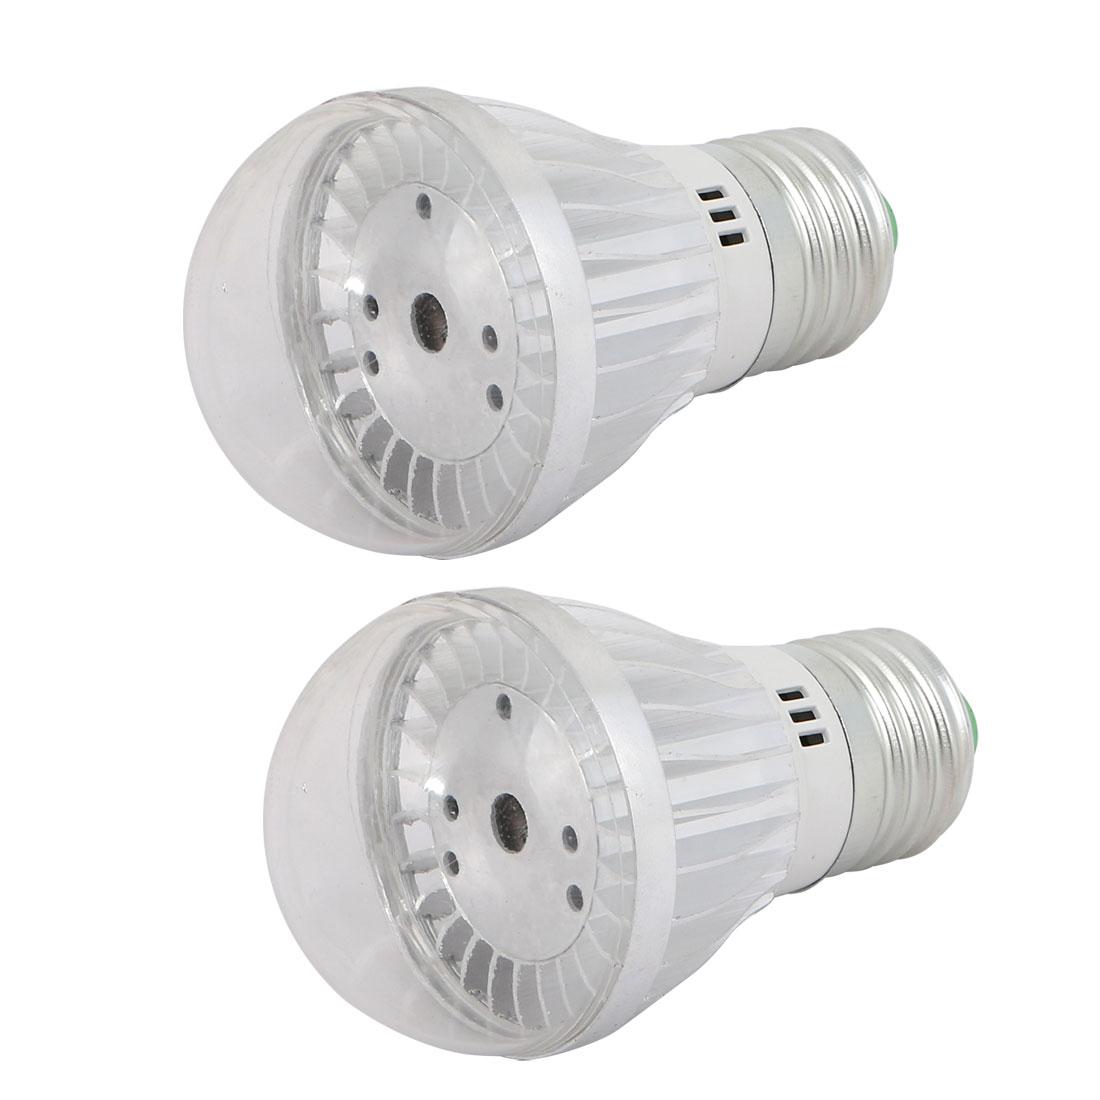 2 Pcs 3W Silver Aluminum Ball - Bulb Lamp Housing E27 Screw Base w Clear Cover